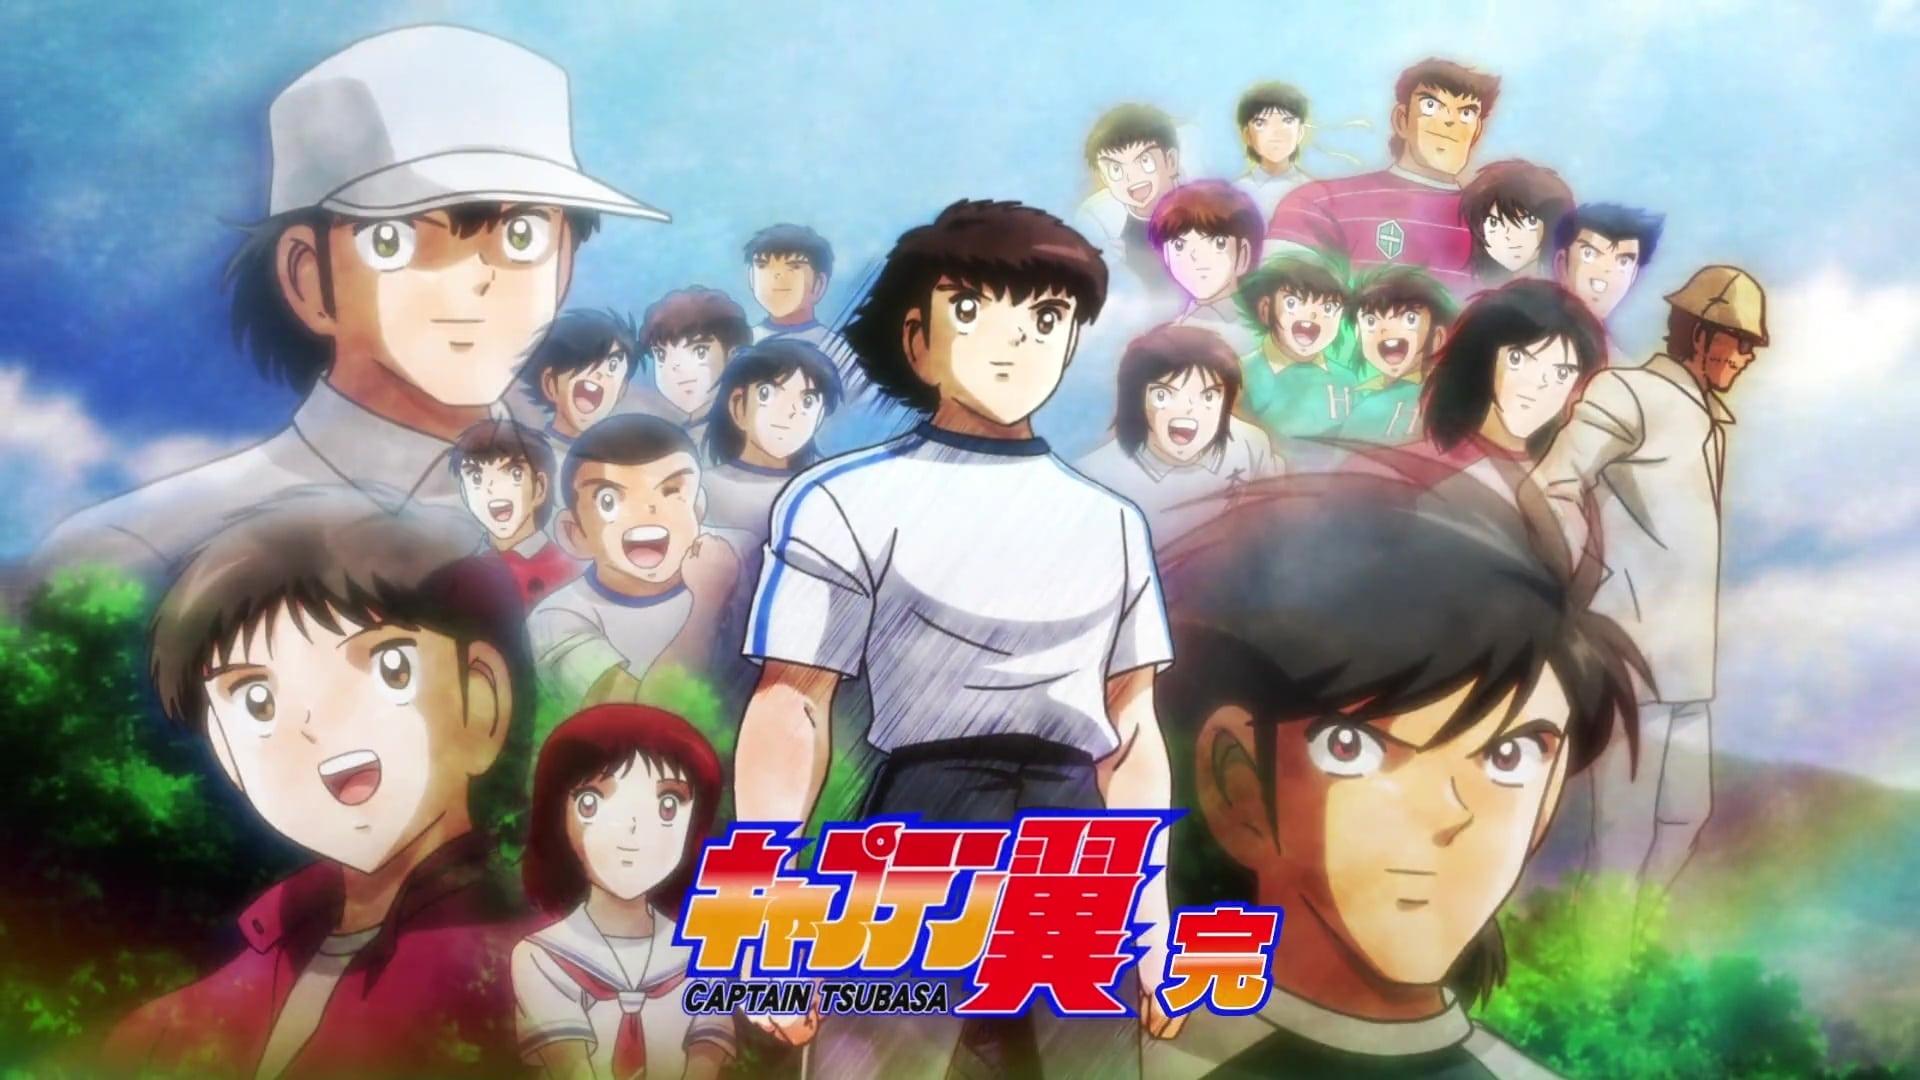 Anime 4k Wallpaper: Streaming Captain Tsubasa: S1